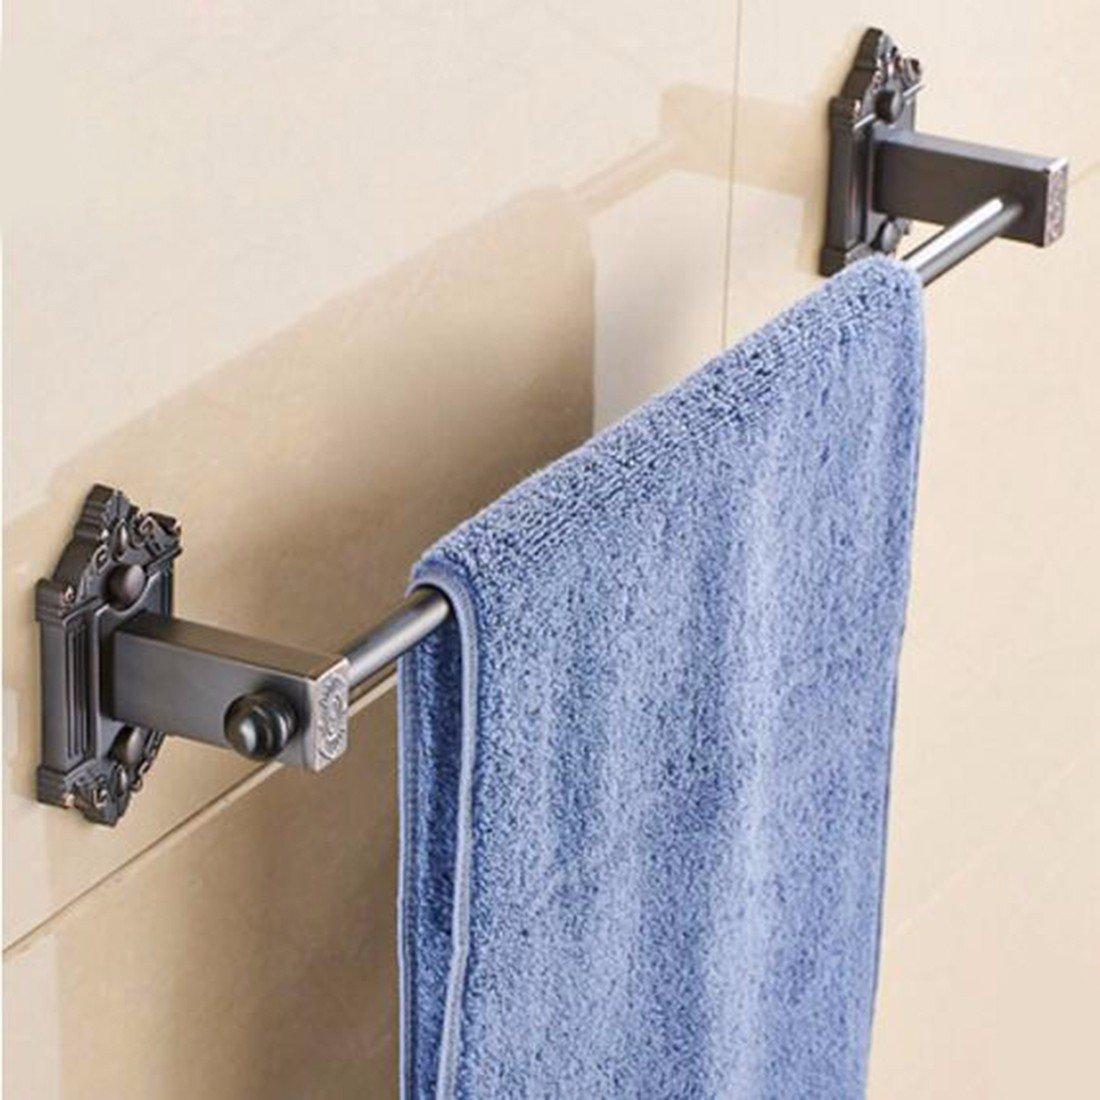 Sursy Jardín de estilo europeo puro cobre antiguo retro toalla toallero barra Barra de toalla de baño Guadan accesorios de hardware,B: Amazon.es: Hogar